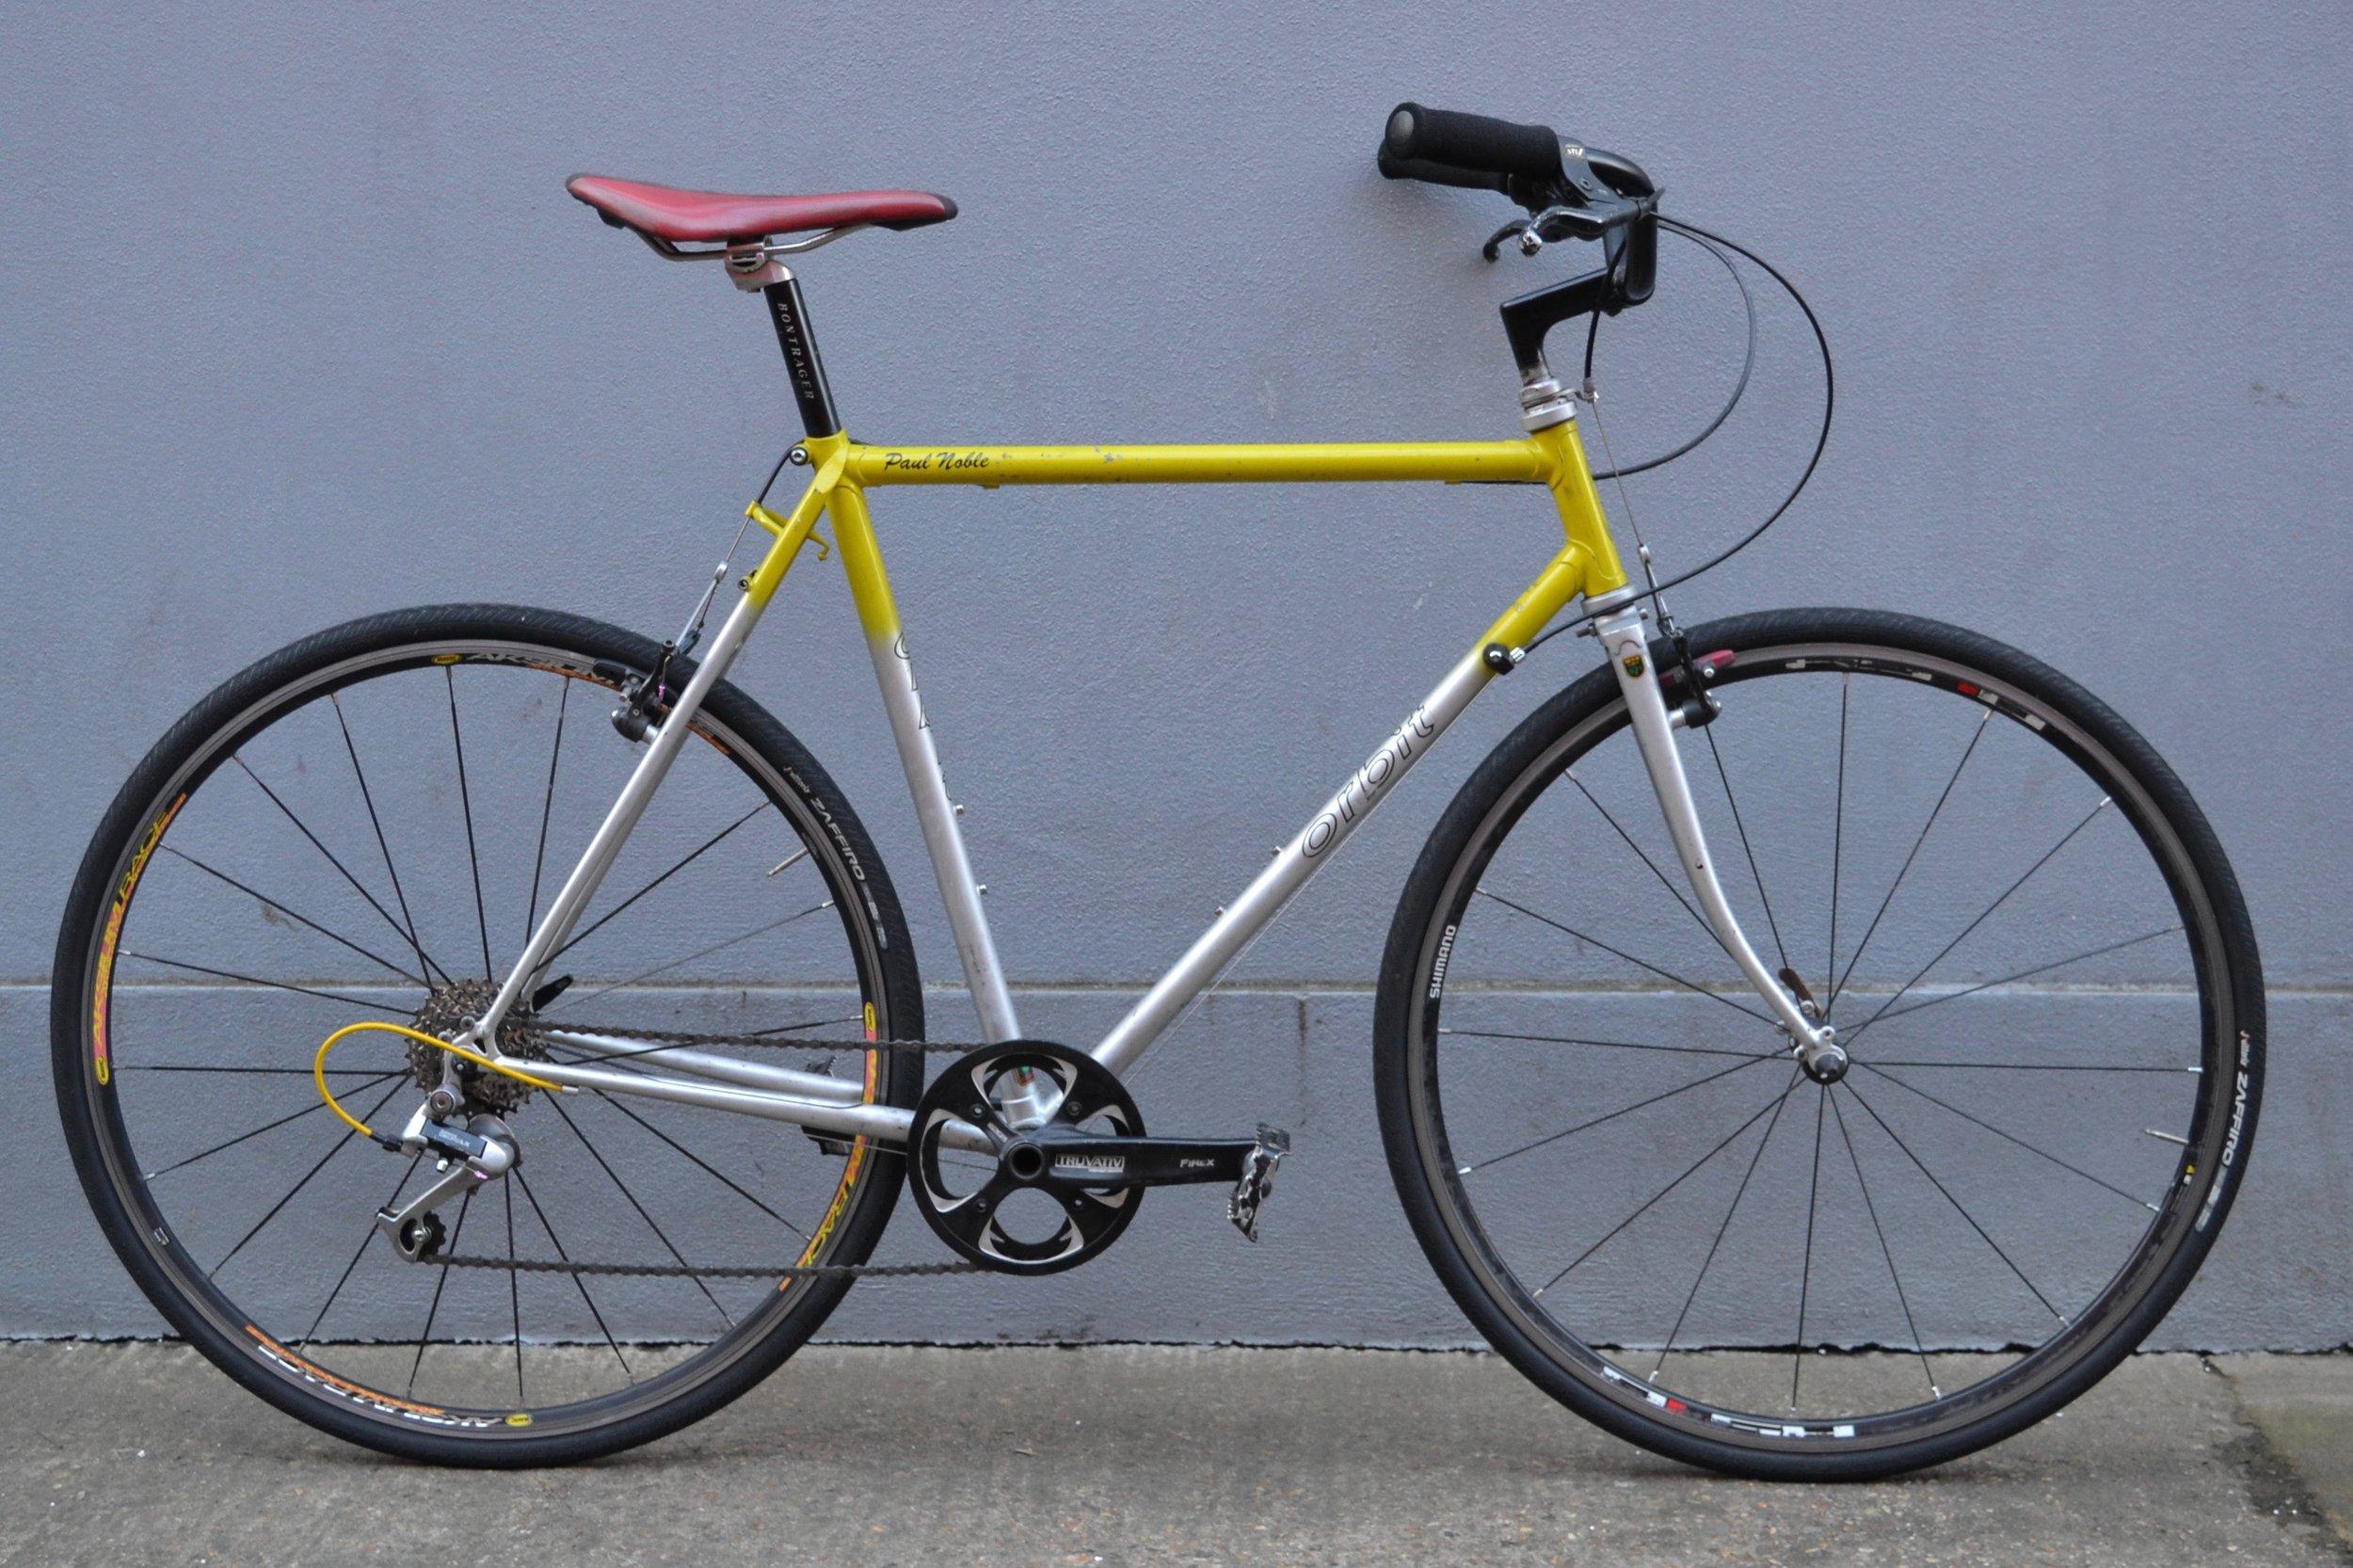 Orbit_Cross_Frame_Reynolds_531c_54cm_frame_big_fun_bikes.jpg